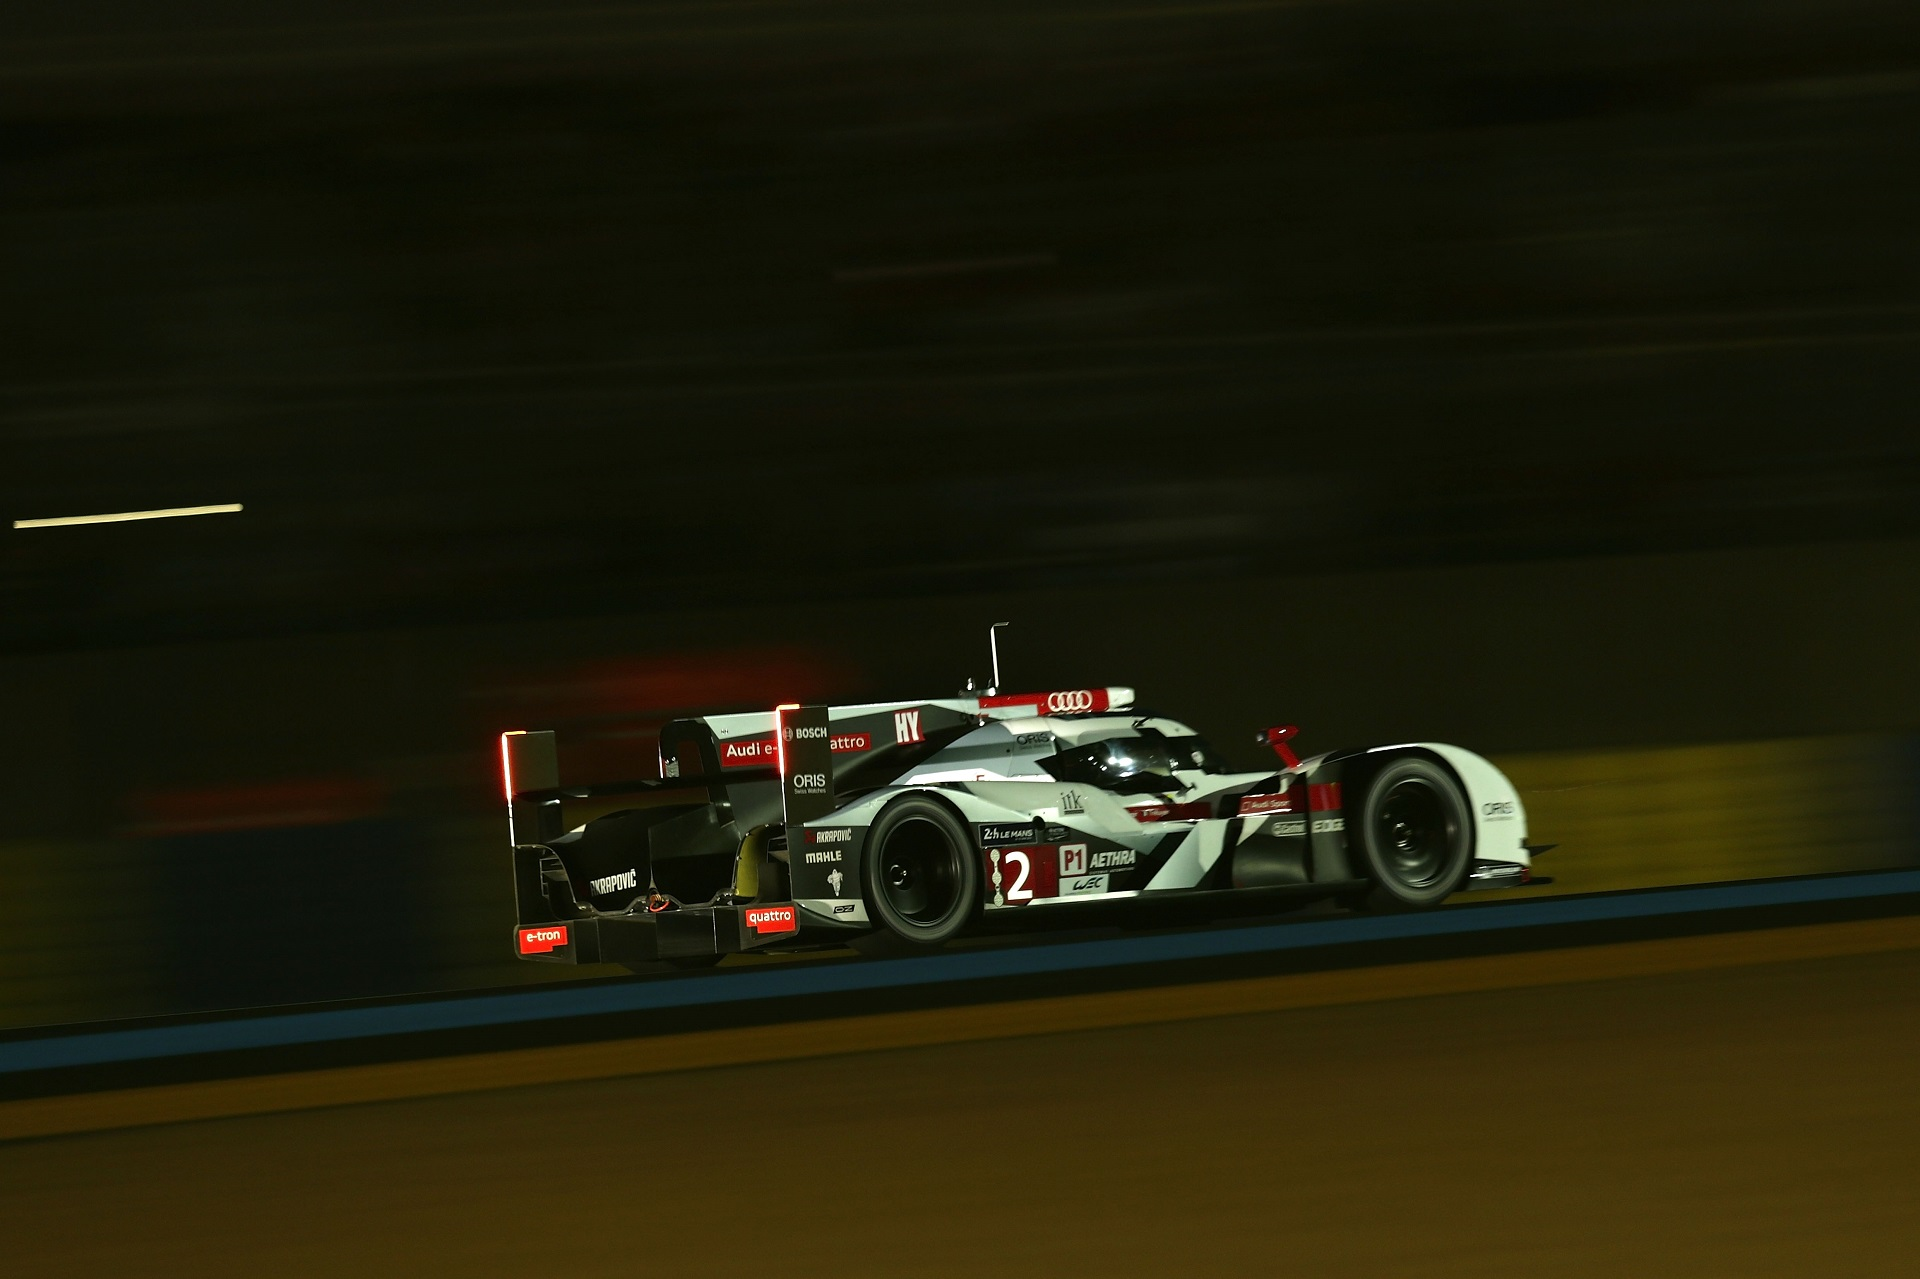 audi_motorsport_140612-3839.jpg